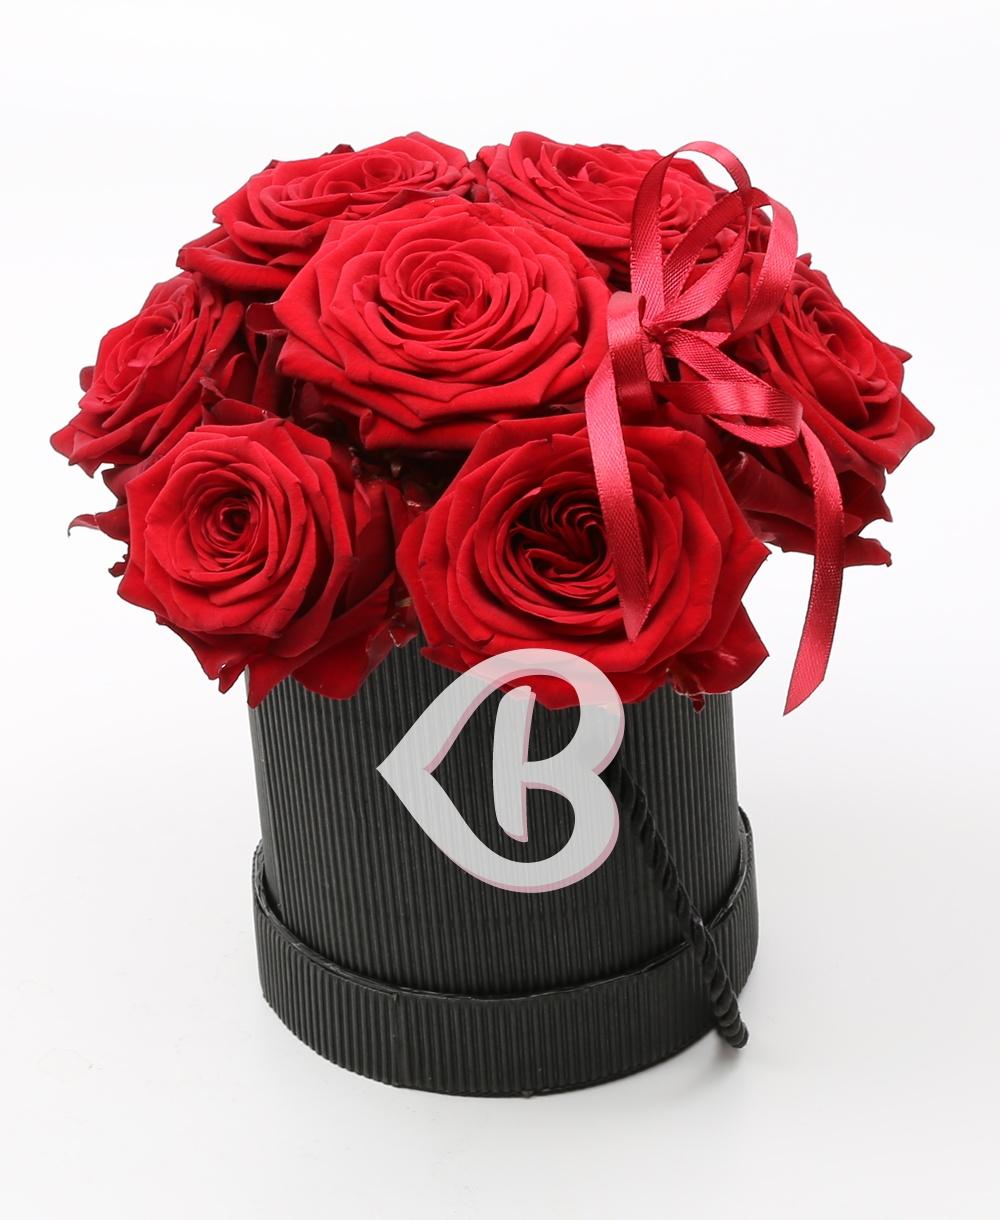 Imaginea produsului Cutie Cu 9 Trandafiri Roșii